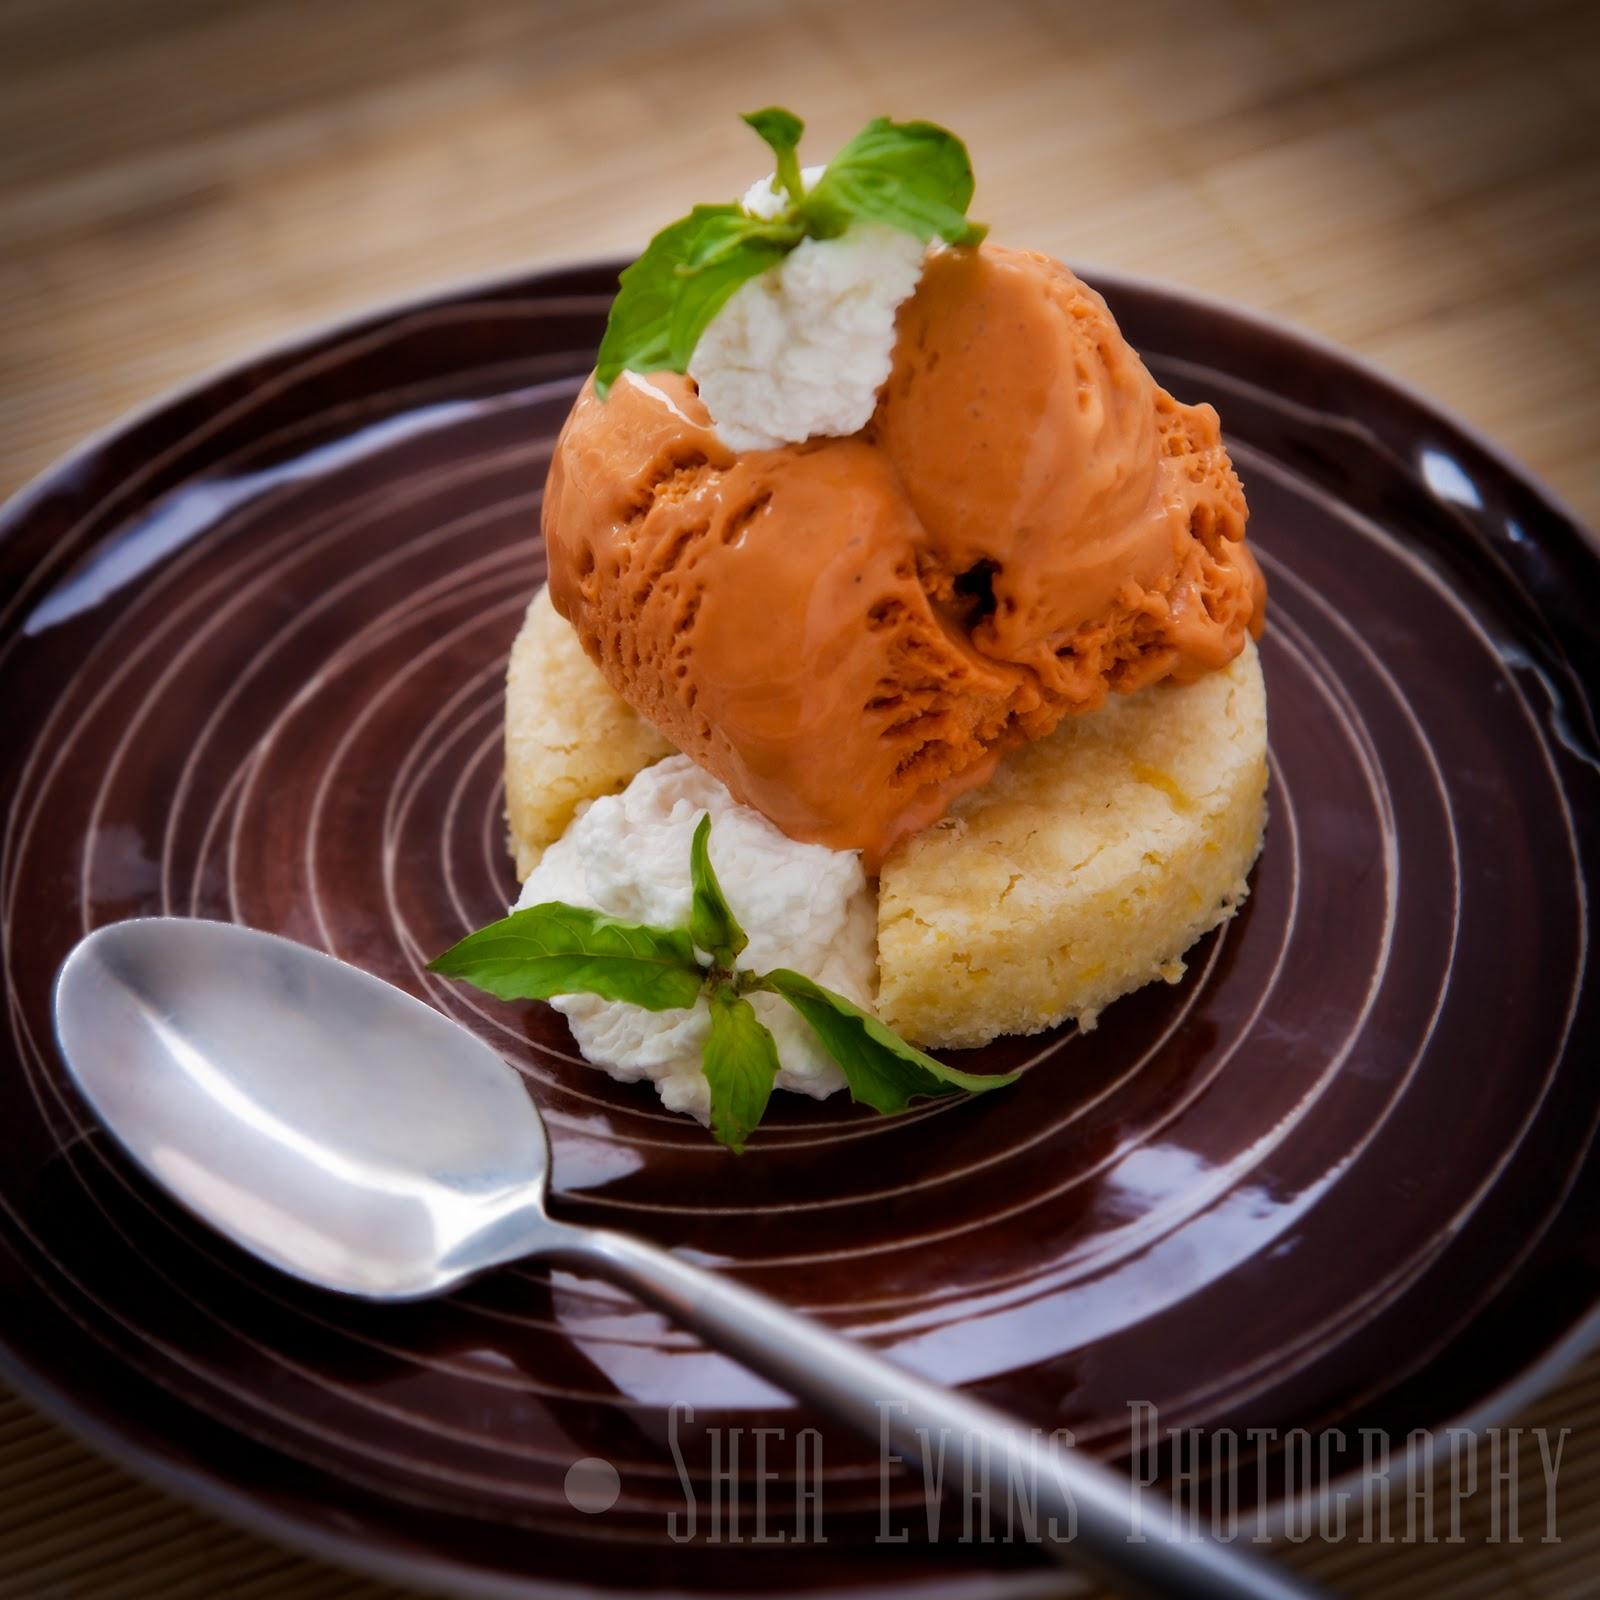 Thai Iced Tea Ice Cream with Lemon Blondies and Basil Whipped Cream ...